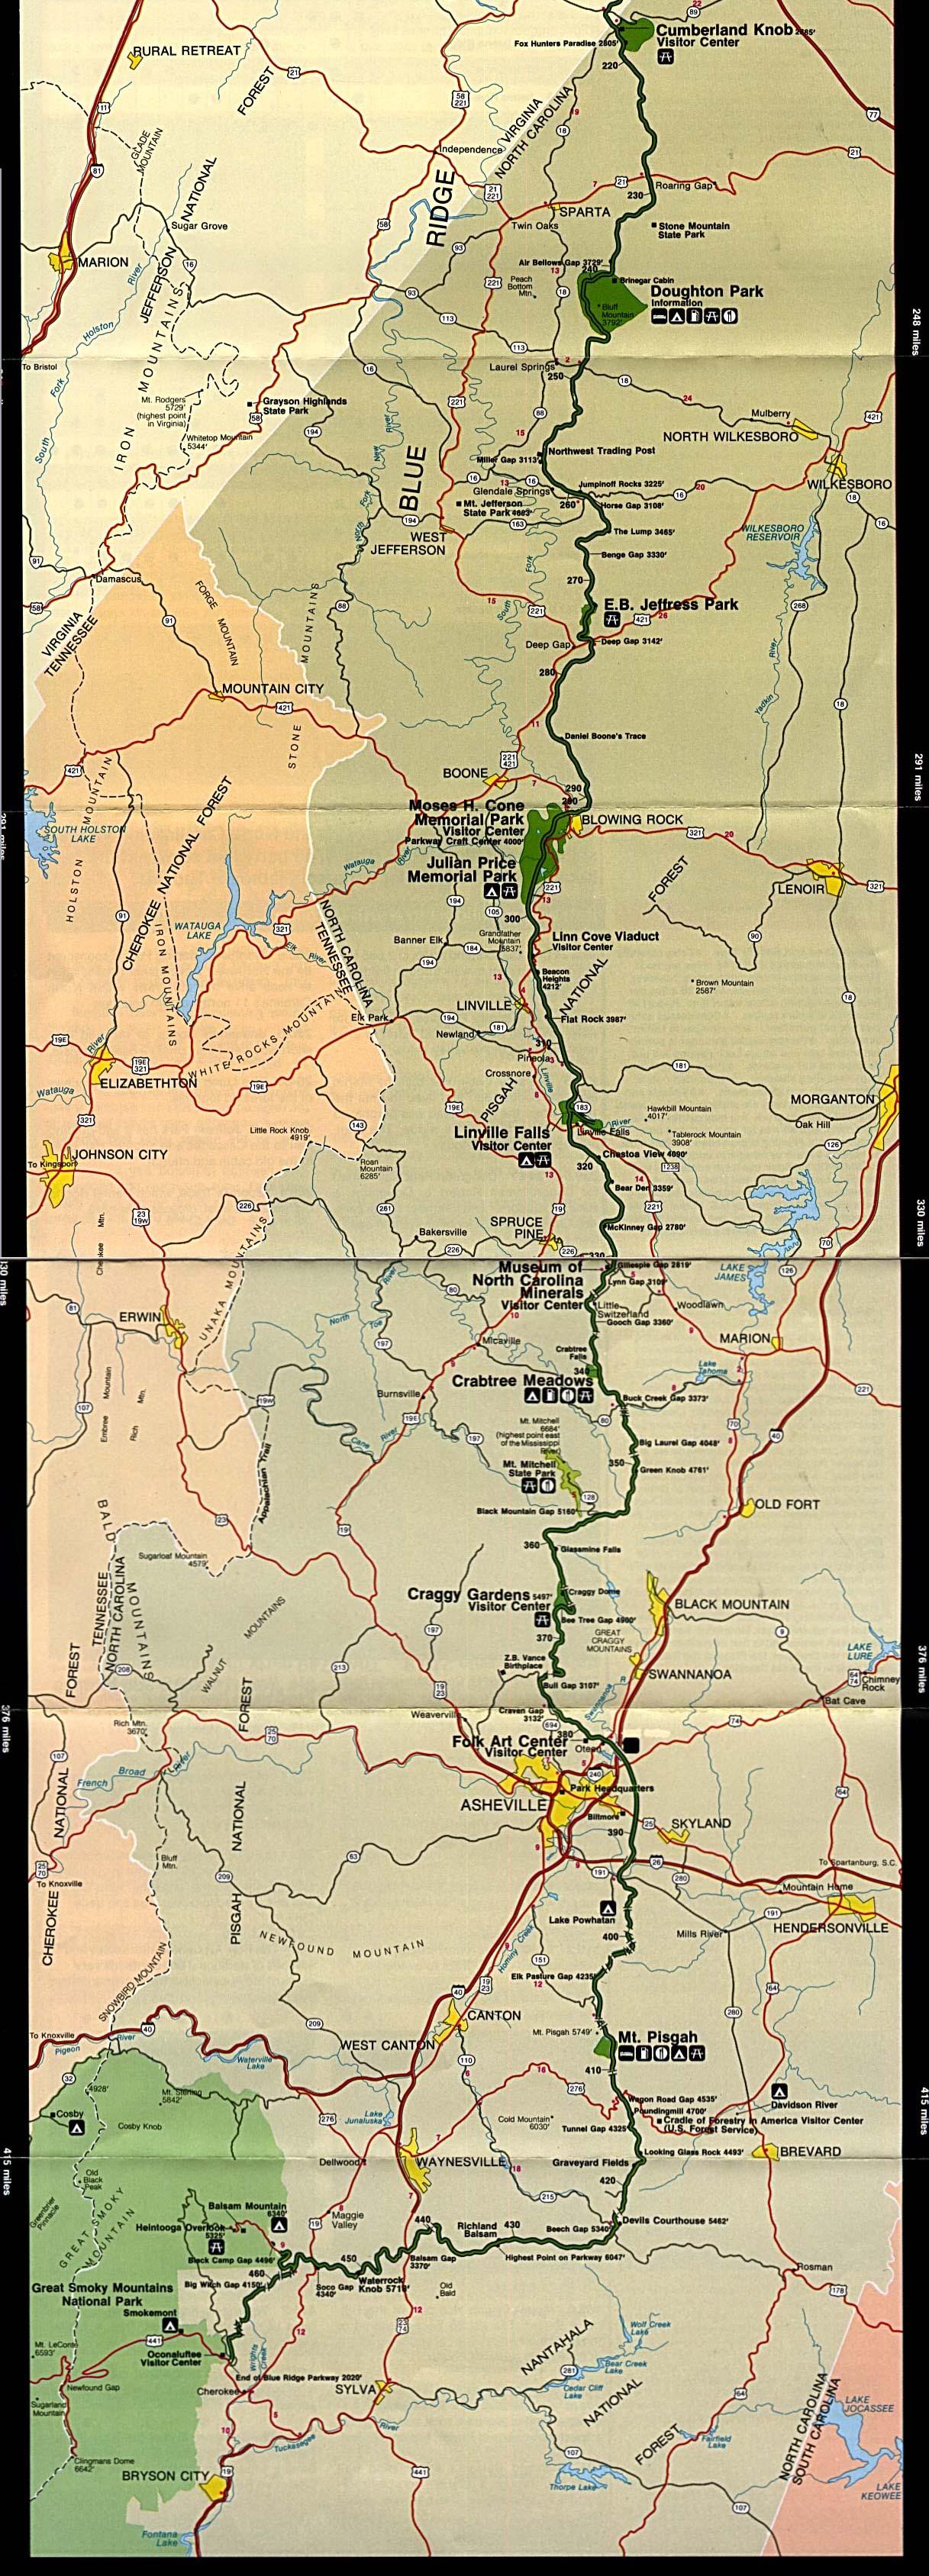 Free Download Virginia National Park Maps - Virginia maps